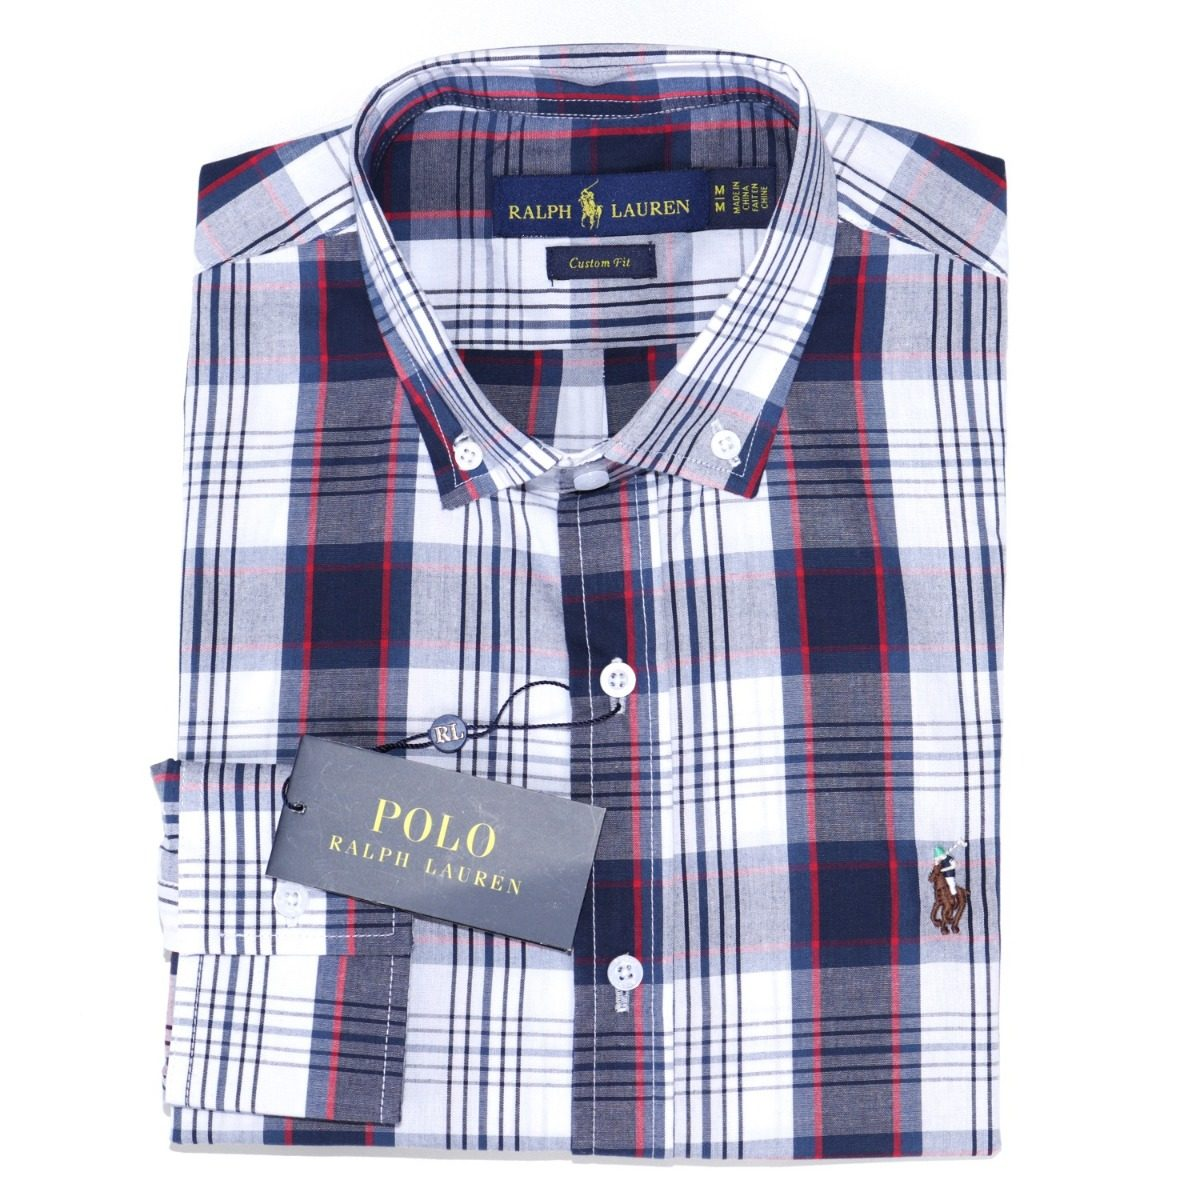 camisa social ralph lauren c fit xadrez branco azul original. Carregando  zoom. b80995b5234